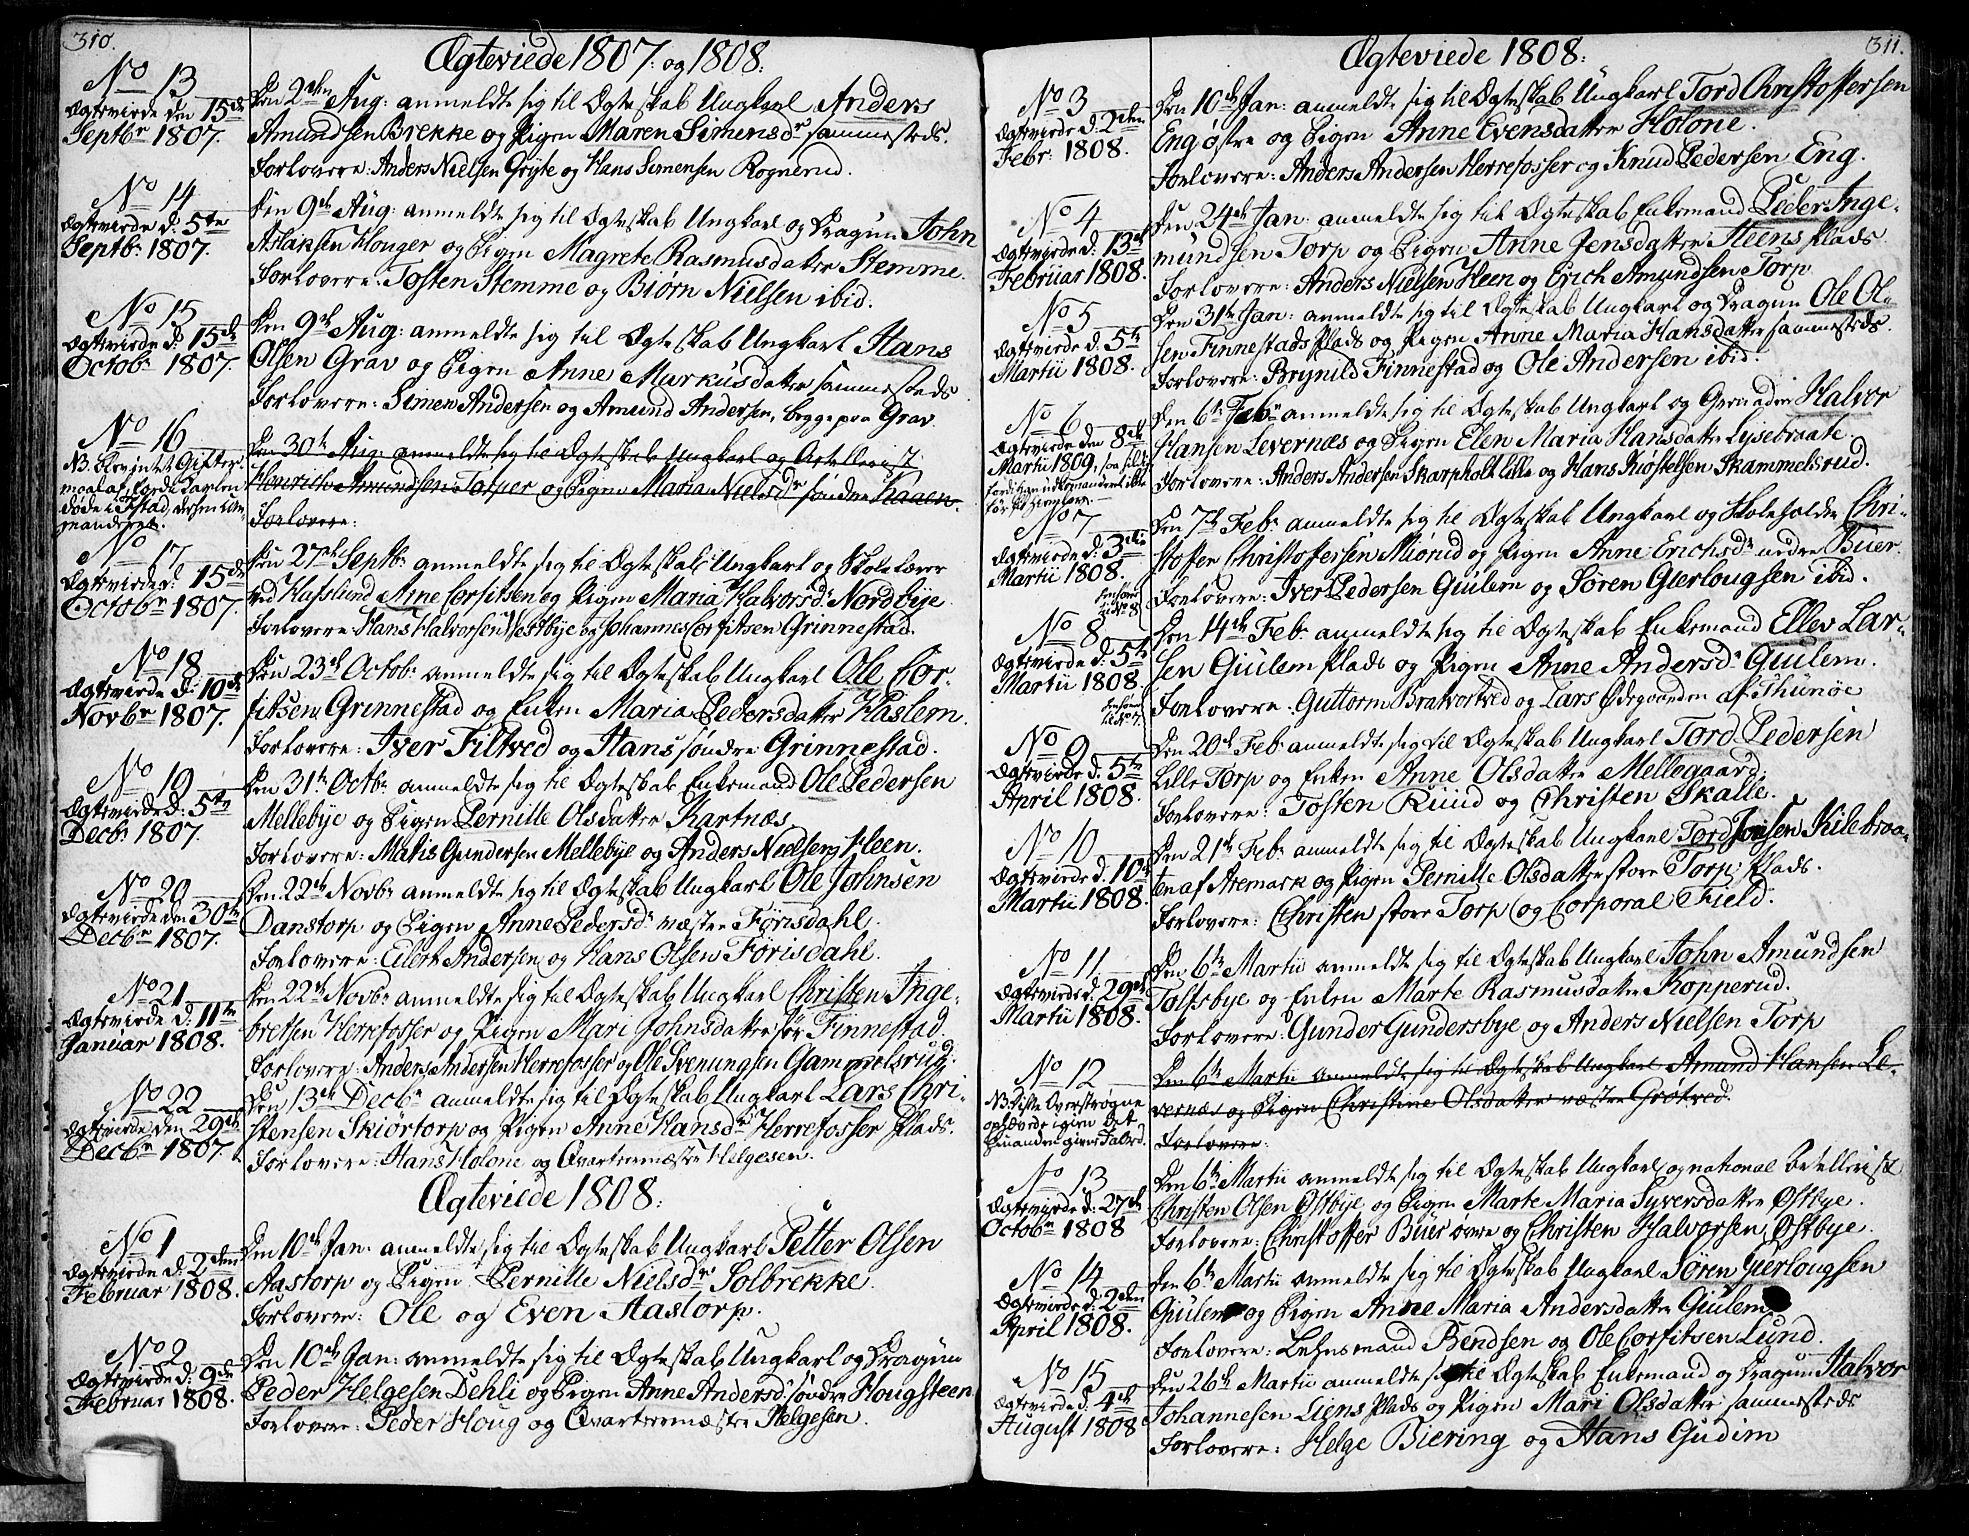 SAO, Rakkestad prestekontor Kirkebøker, F/Fa/L0005: Ministerialbok nr. I 5, 1784-1814, s. 310-311